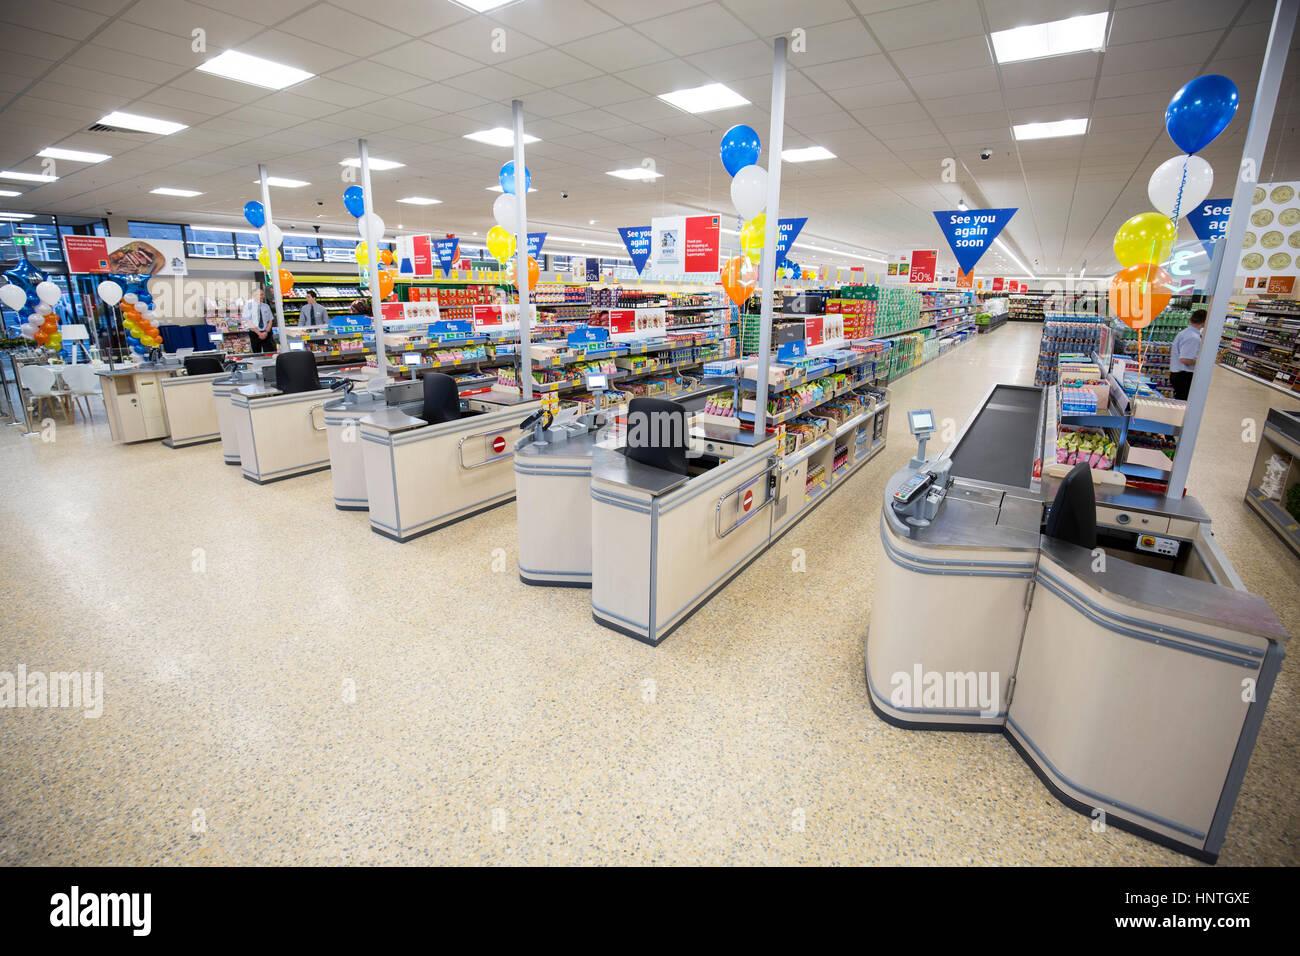 Aldi Supermarket store - Stock Image